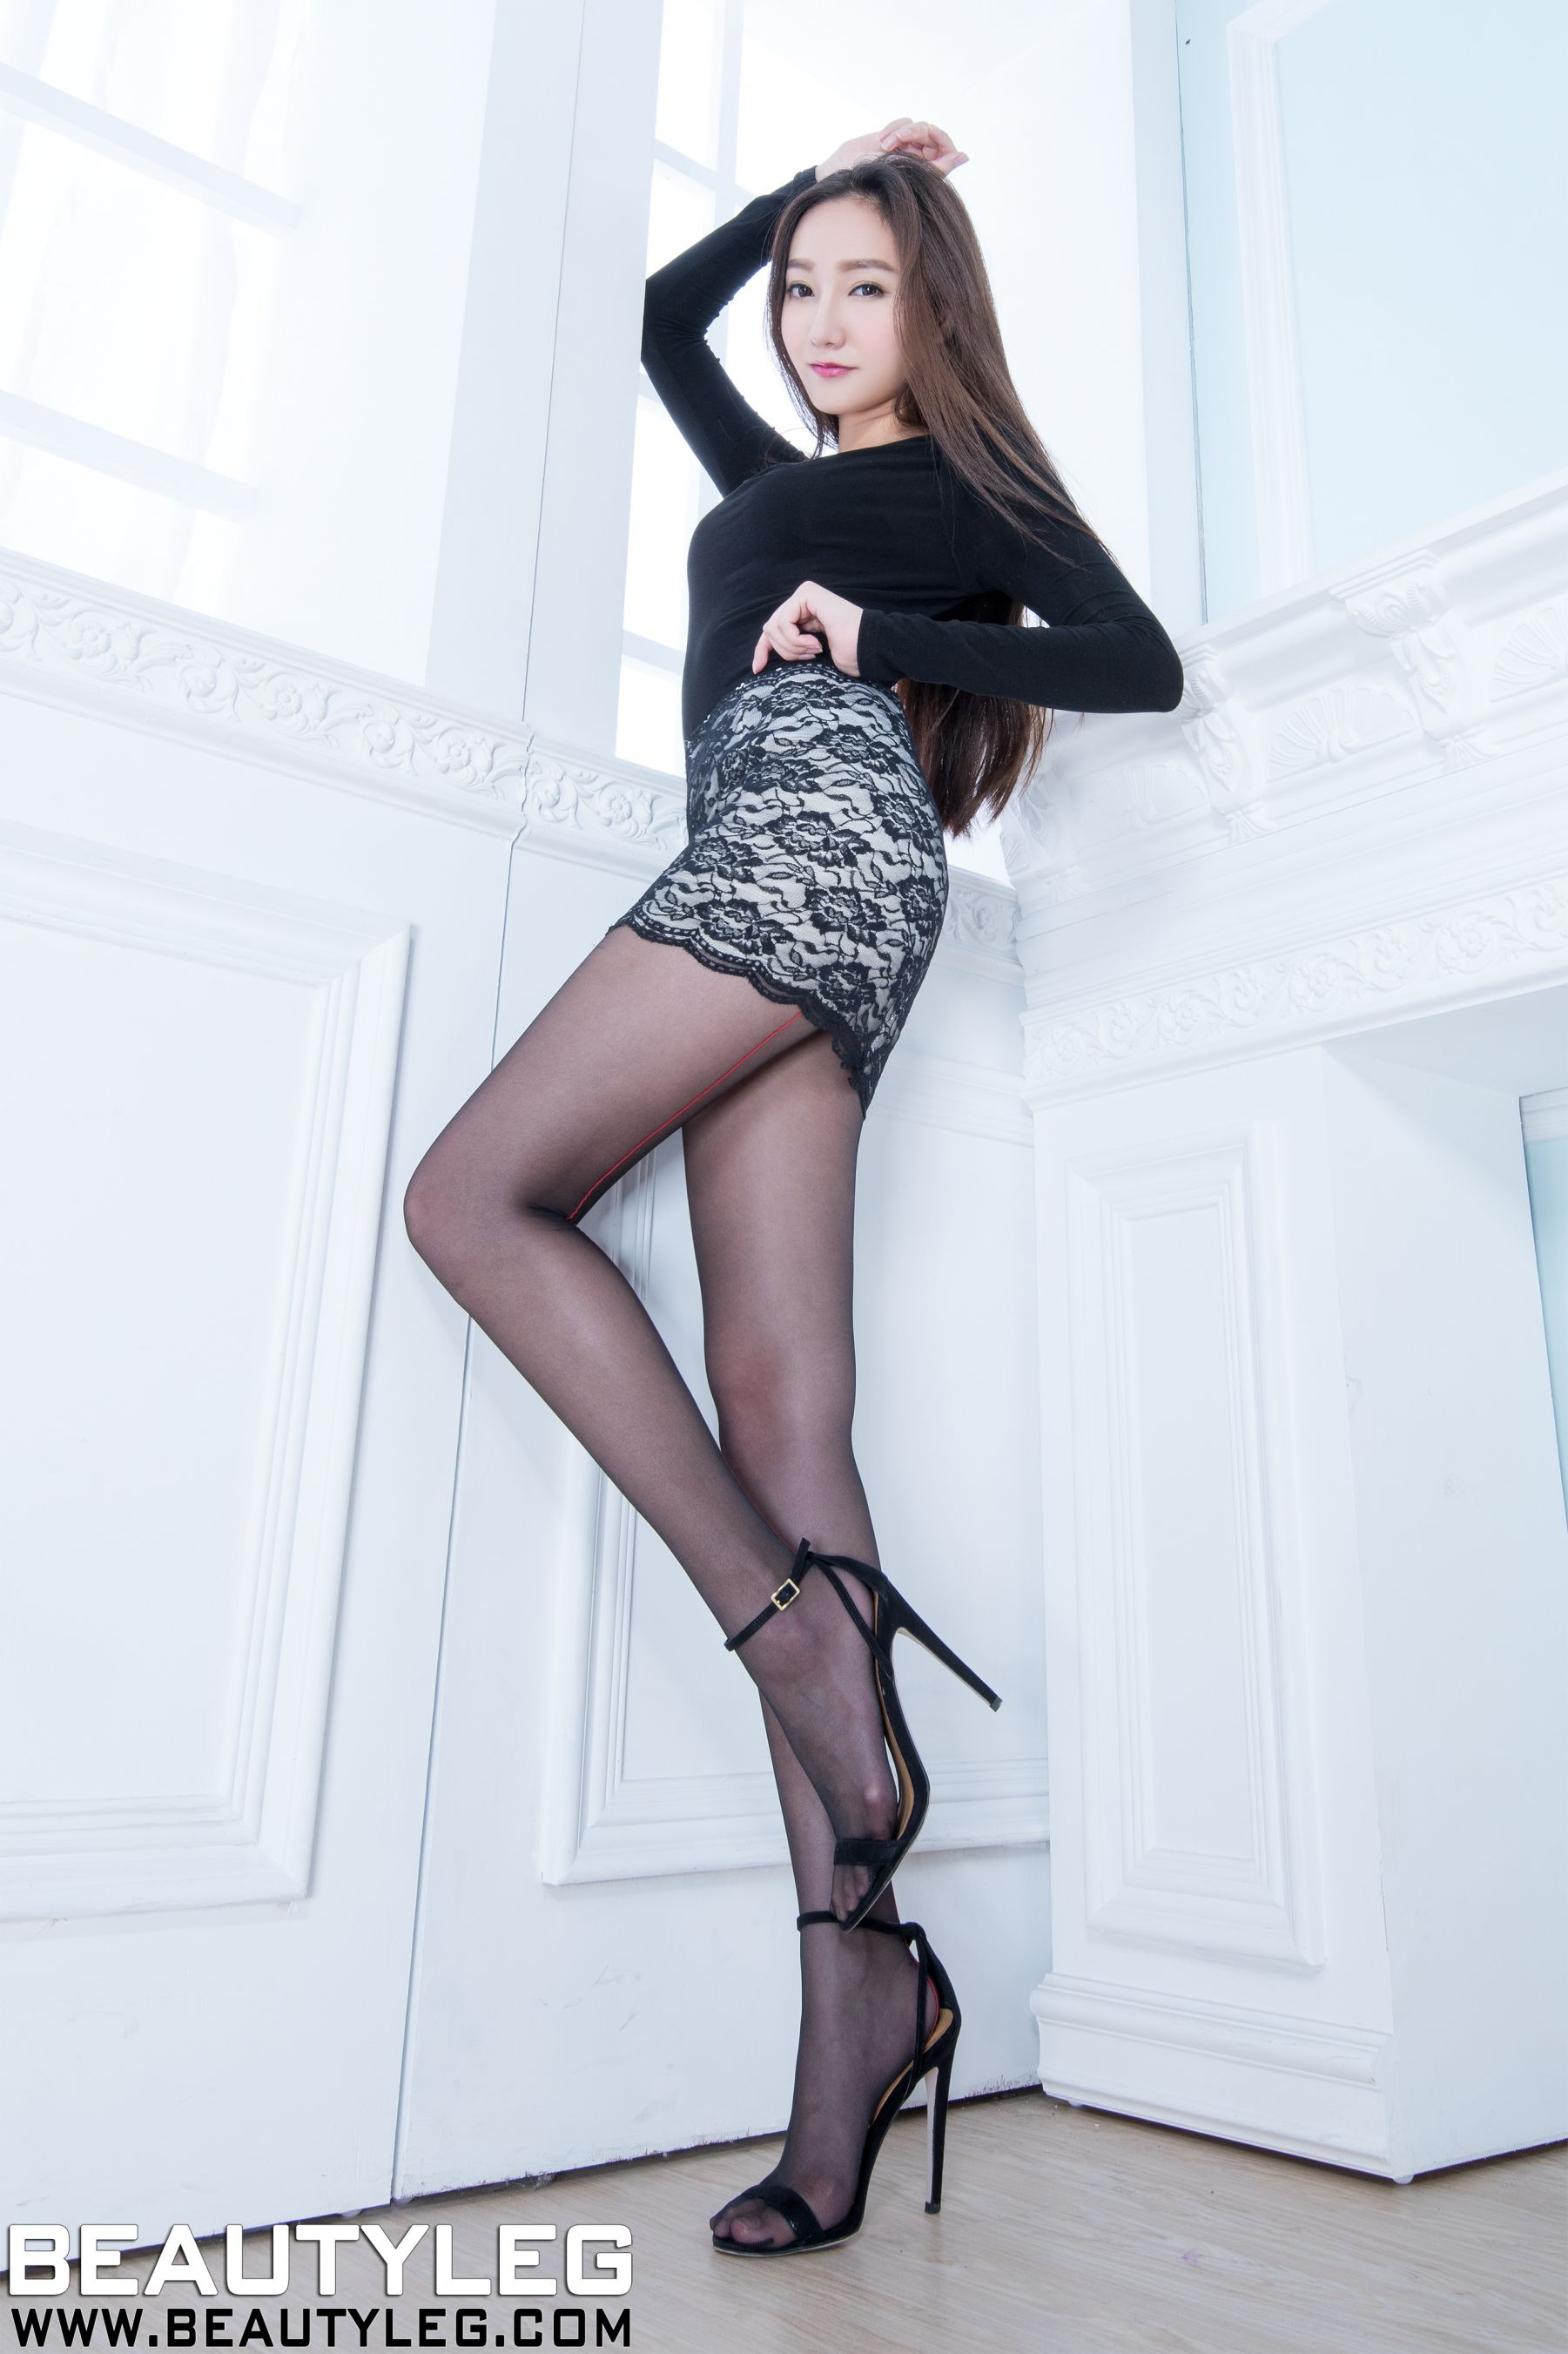 VOL.1238 [Beautyleg]长腿美女:陈思婷(腿模Tina,李霜)高品质写真套图(63P)